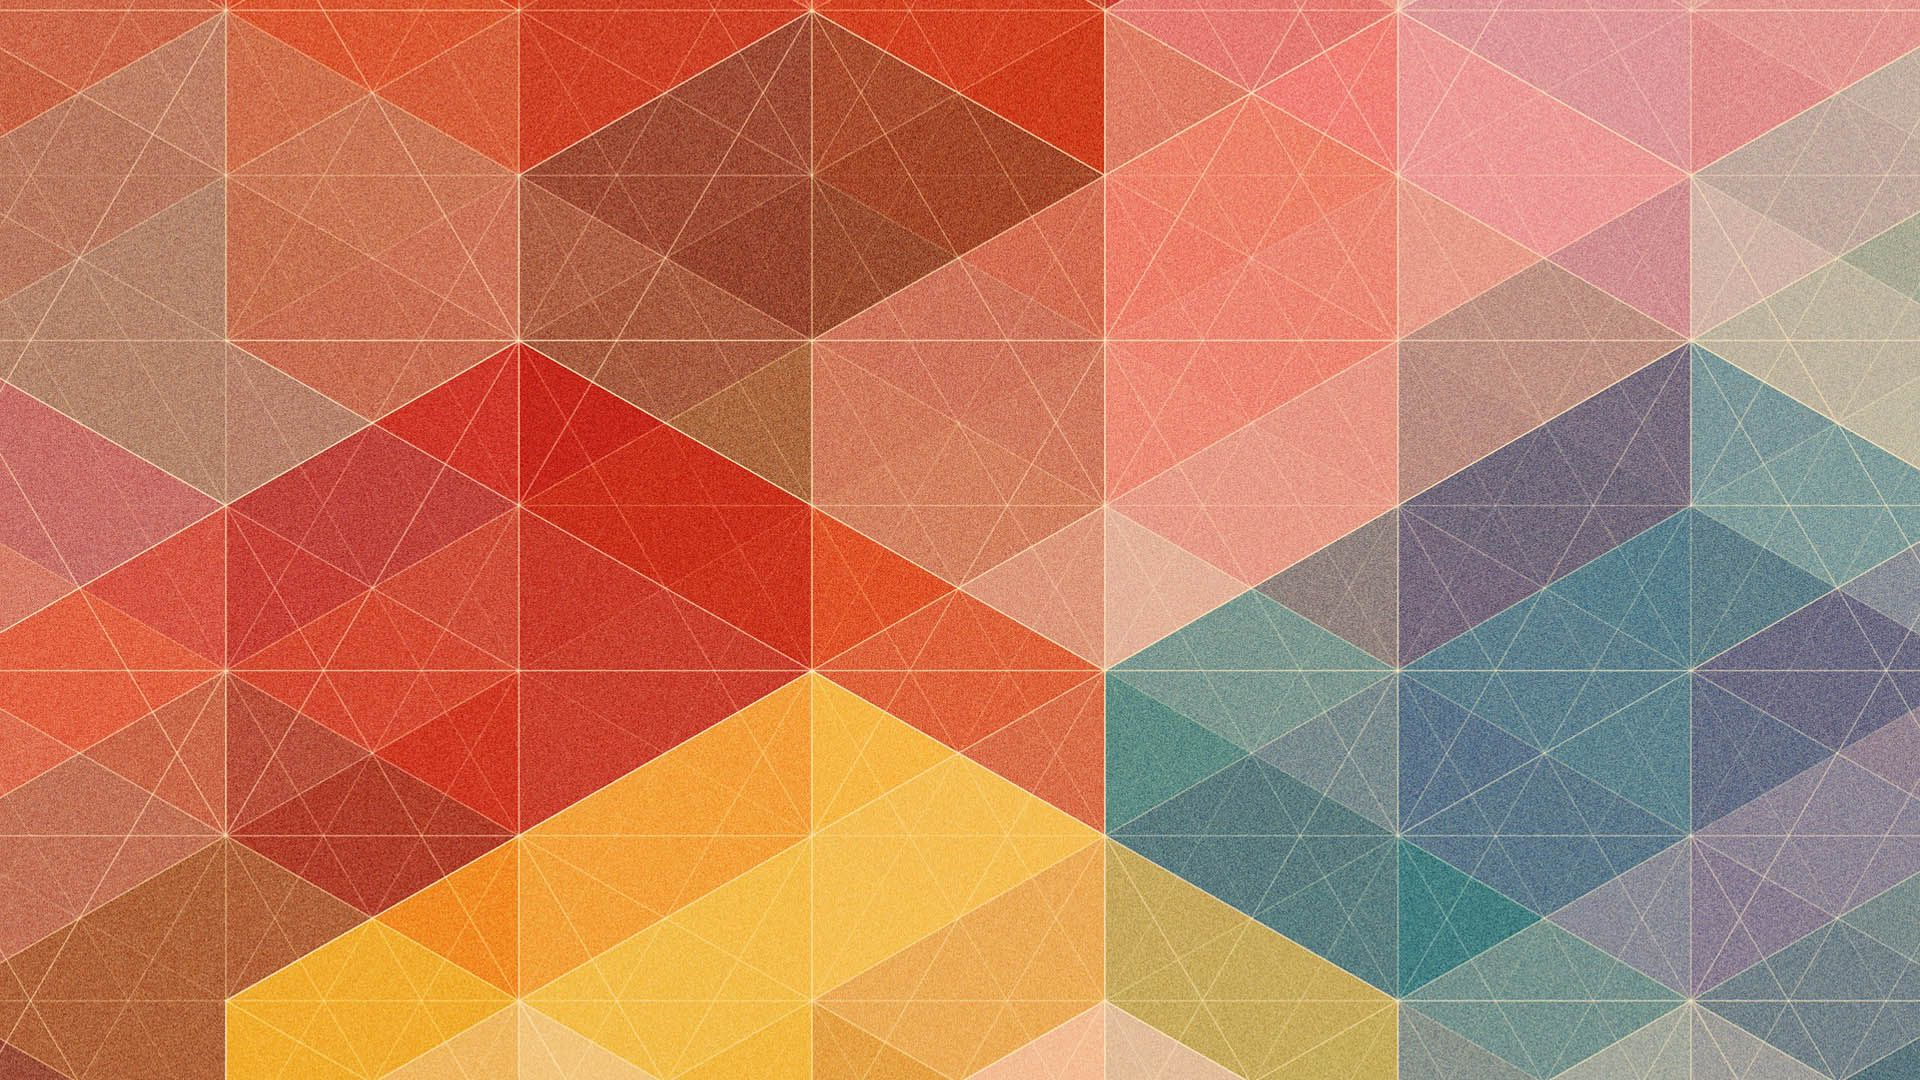 Great Wallpaper High Resolution Geometric - 773c62498b4f8b37bde0deb955918cc4  Trends_97913.jpg